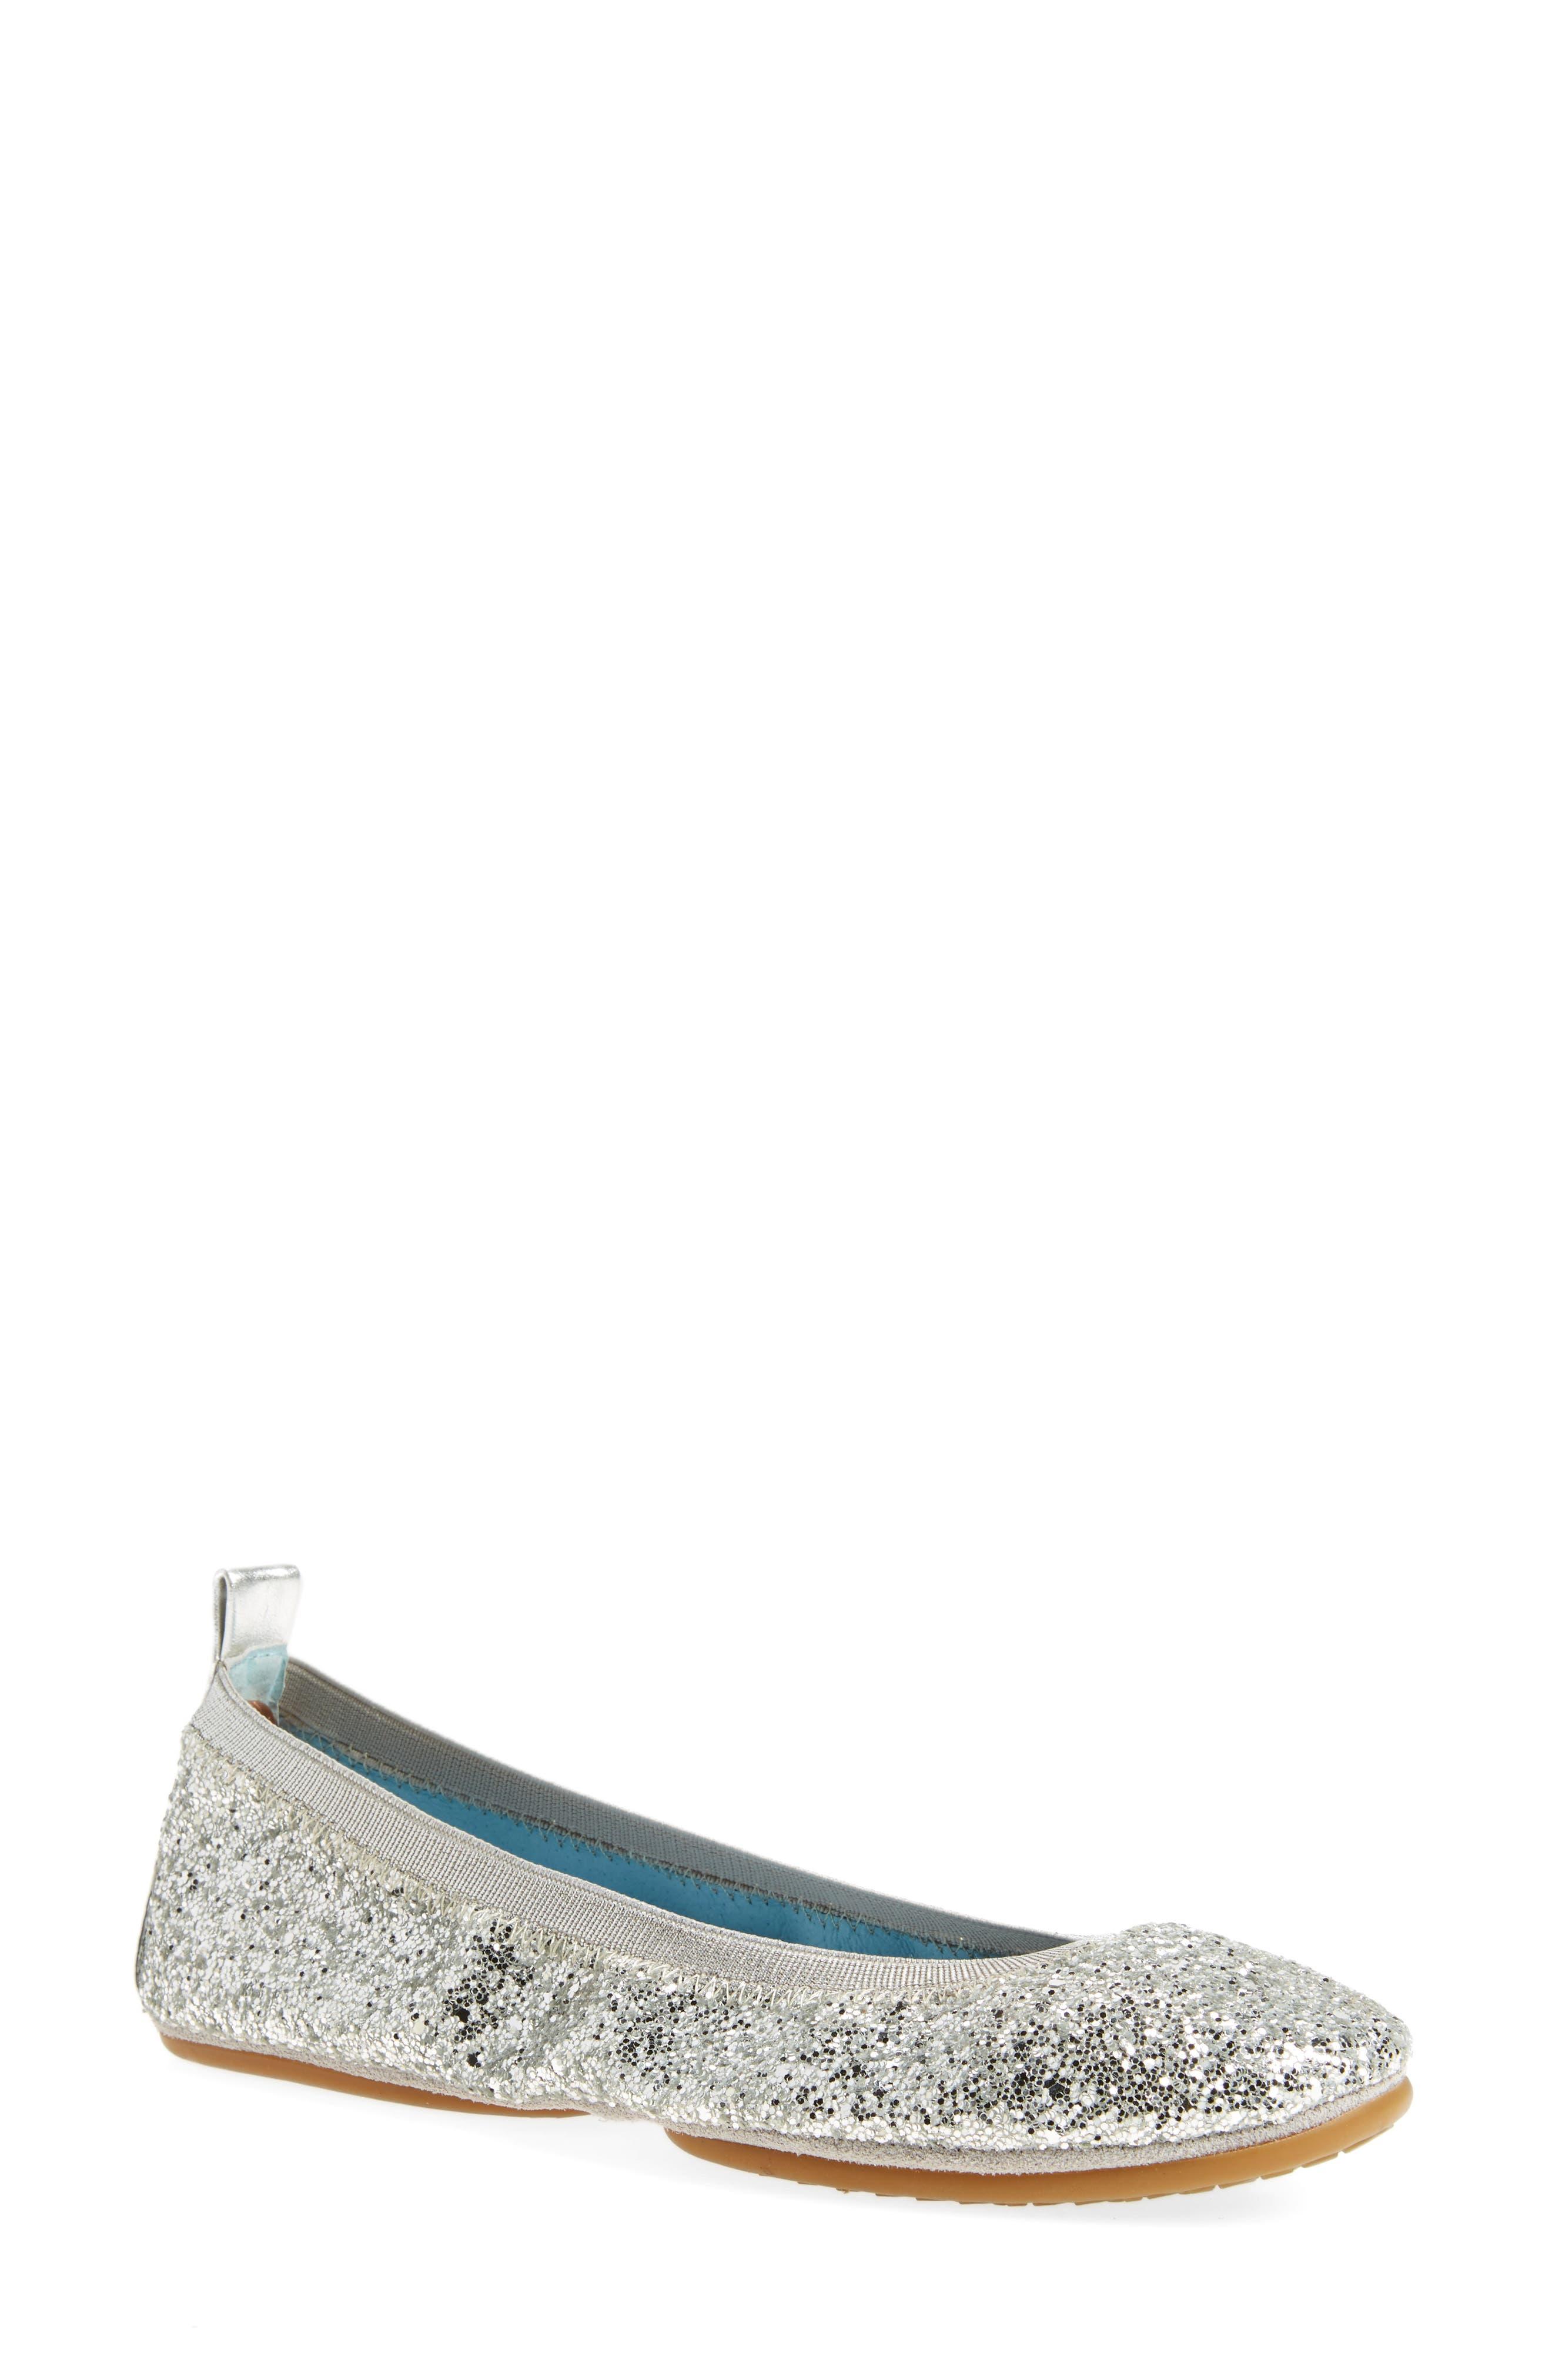 Serna Foldable Glitter Ballet Flat,                         Main,                         color, Platinum Glitter